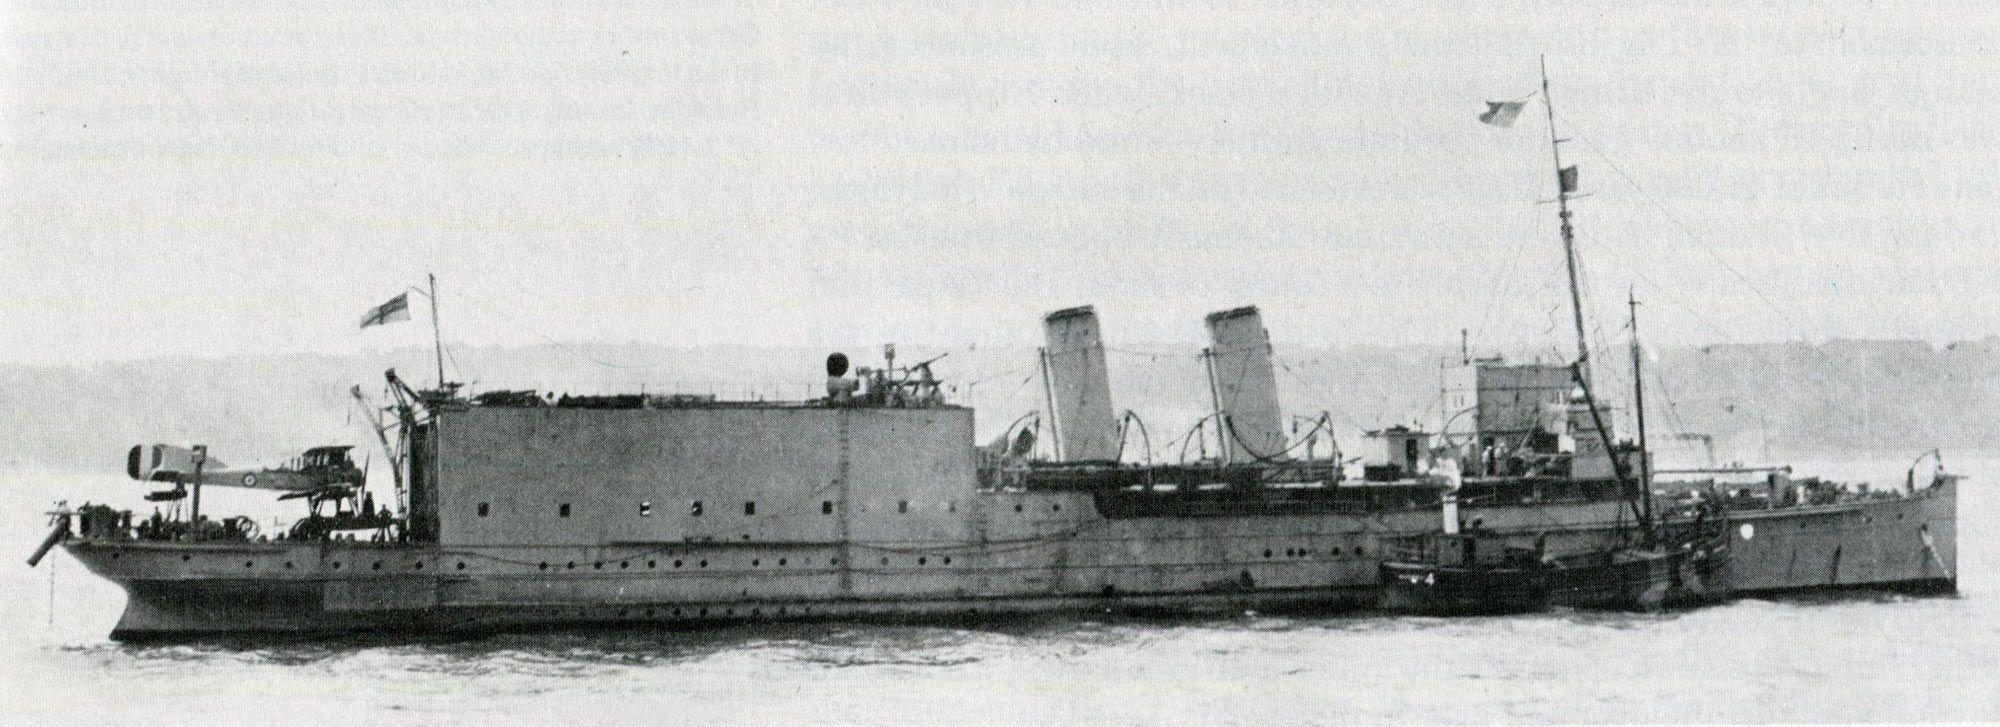 HMS Engandine